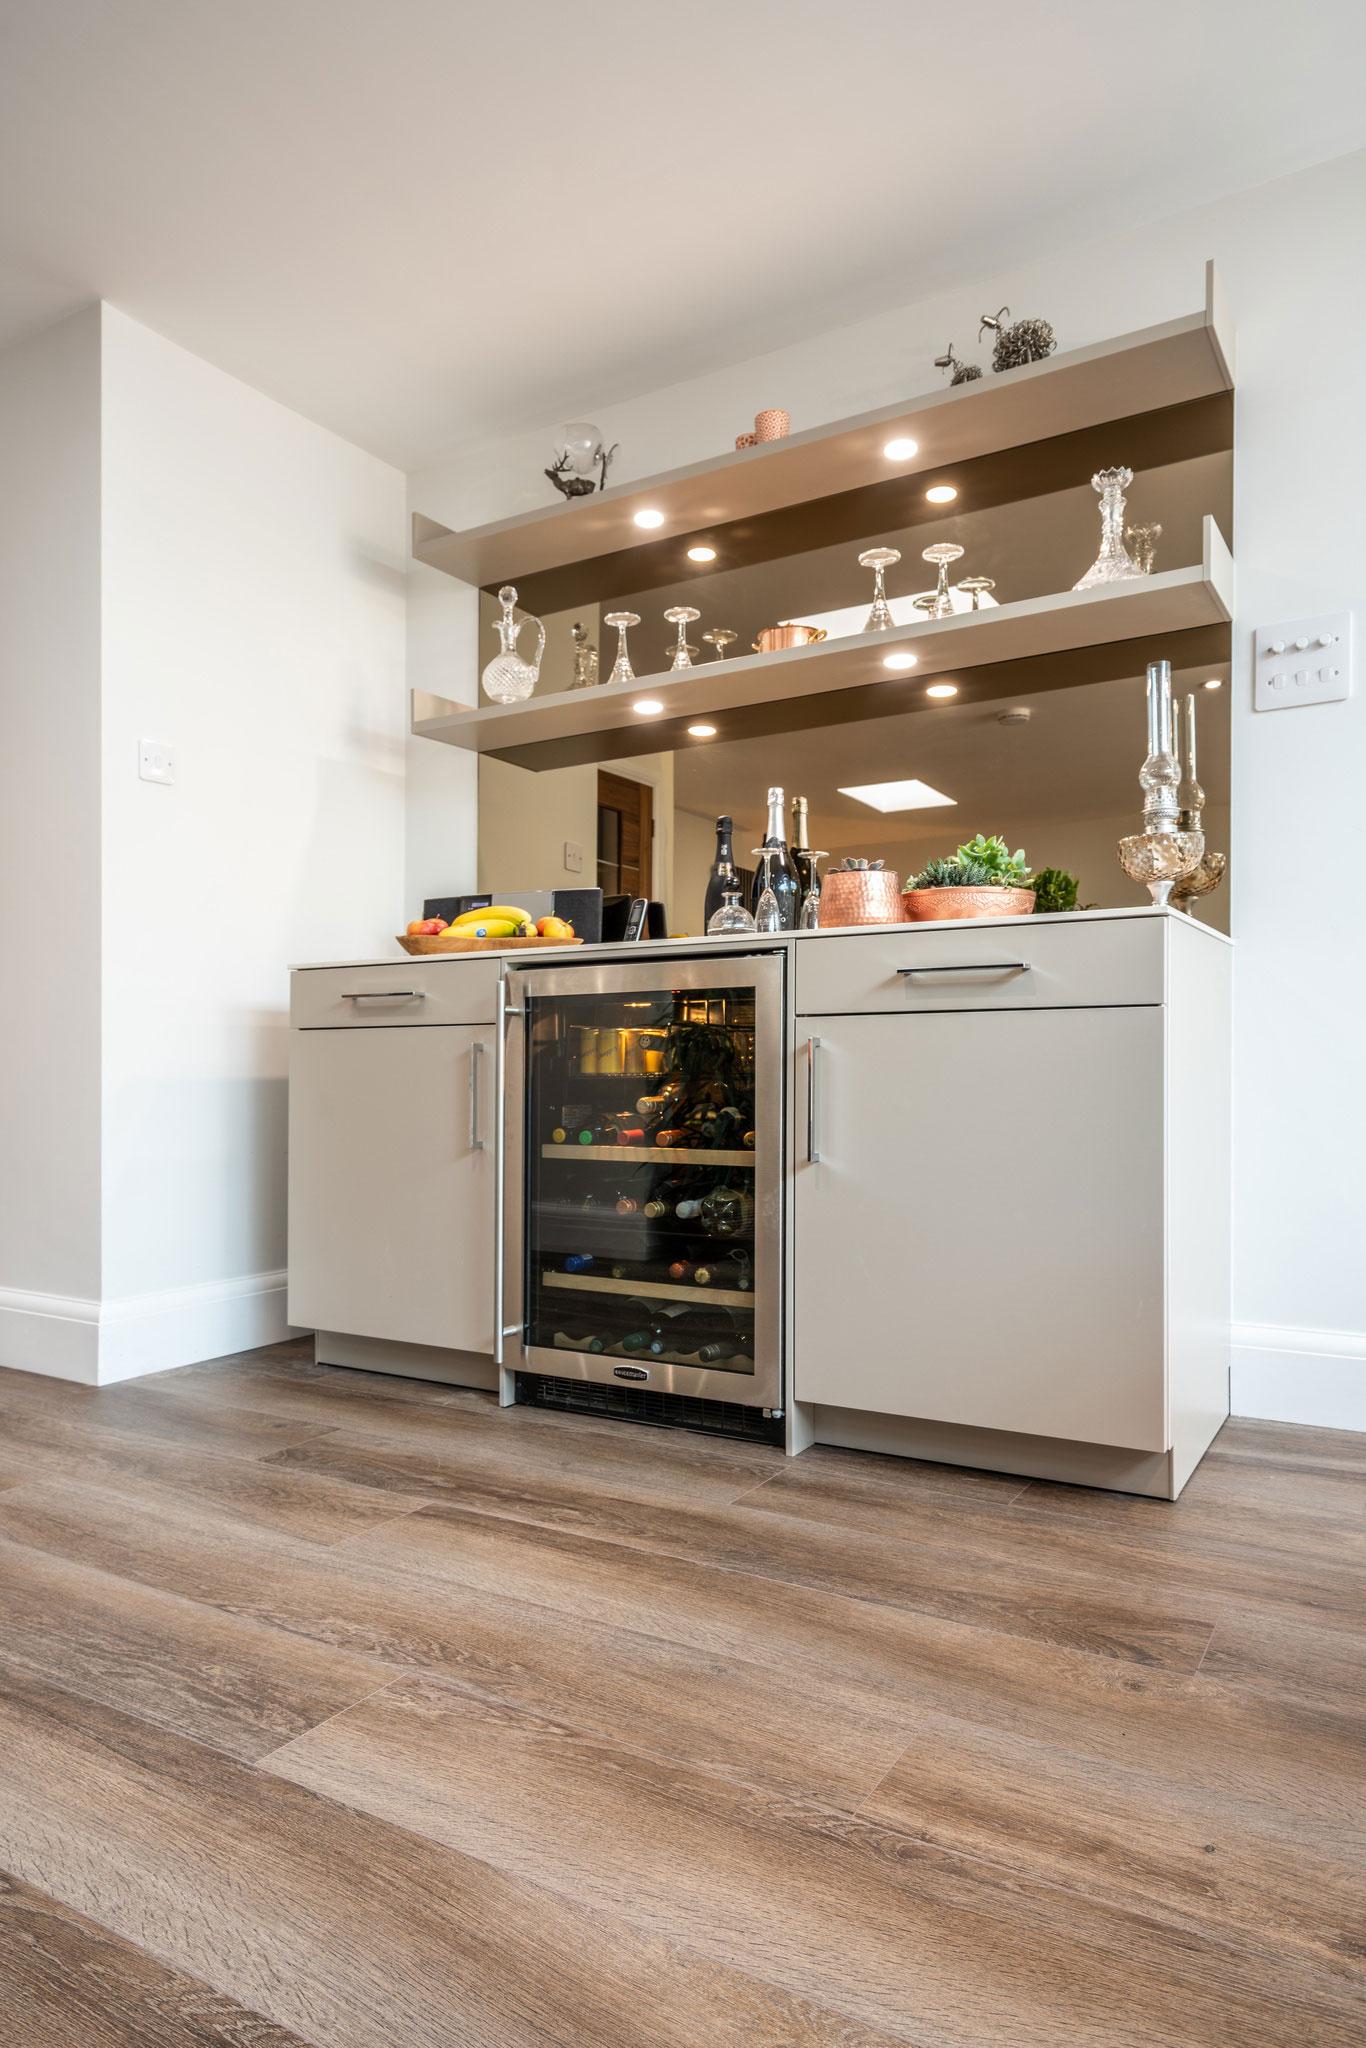 Image of Myers Touch Daniels Kitchen 01139 ZF 2442 14358 1 050 in Een ruimte ontworpen om te socializen - Cosentino